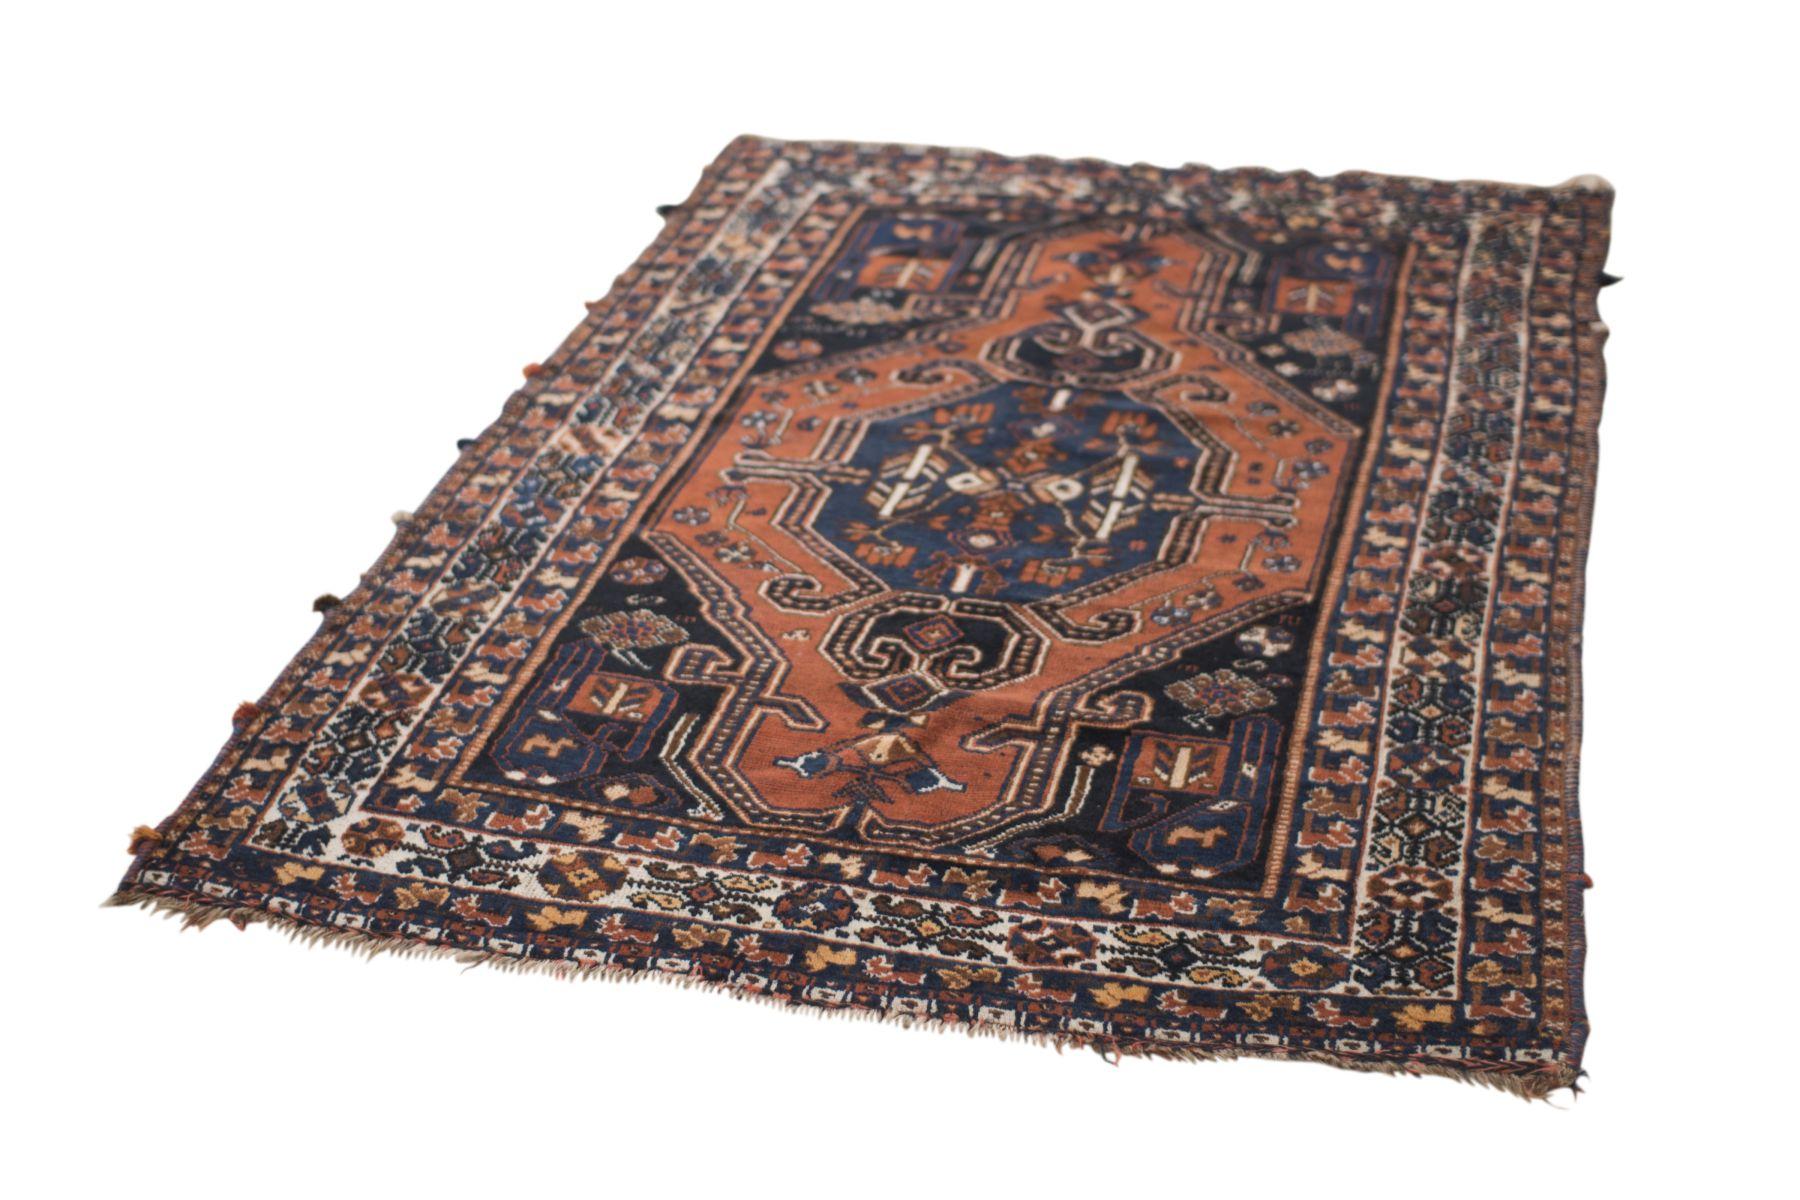 #76 Shiraz carpet | Shiraz Teppich Image